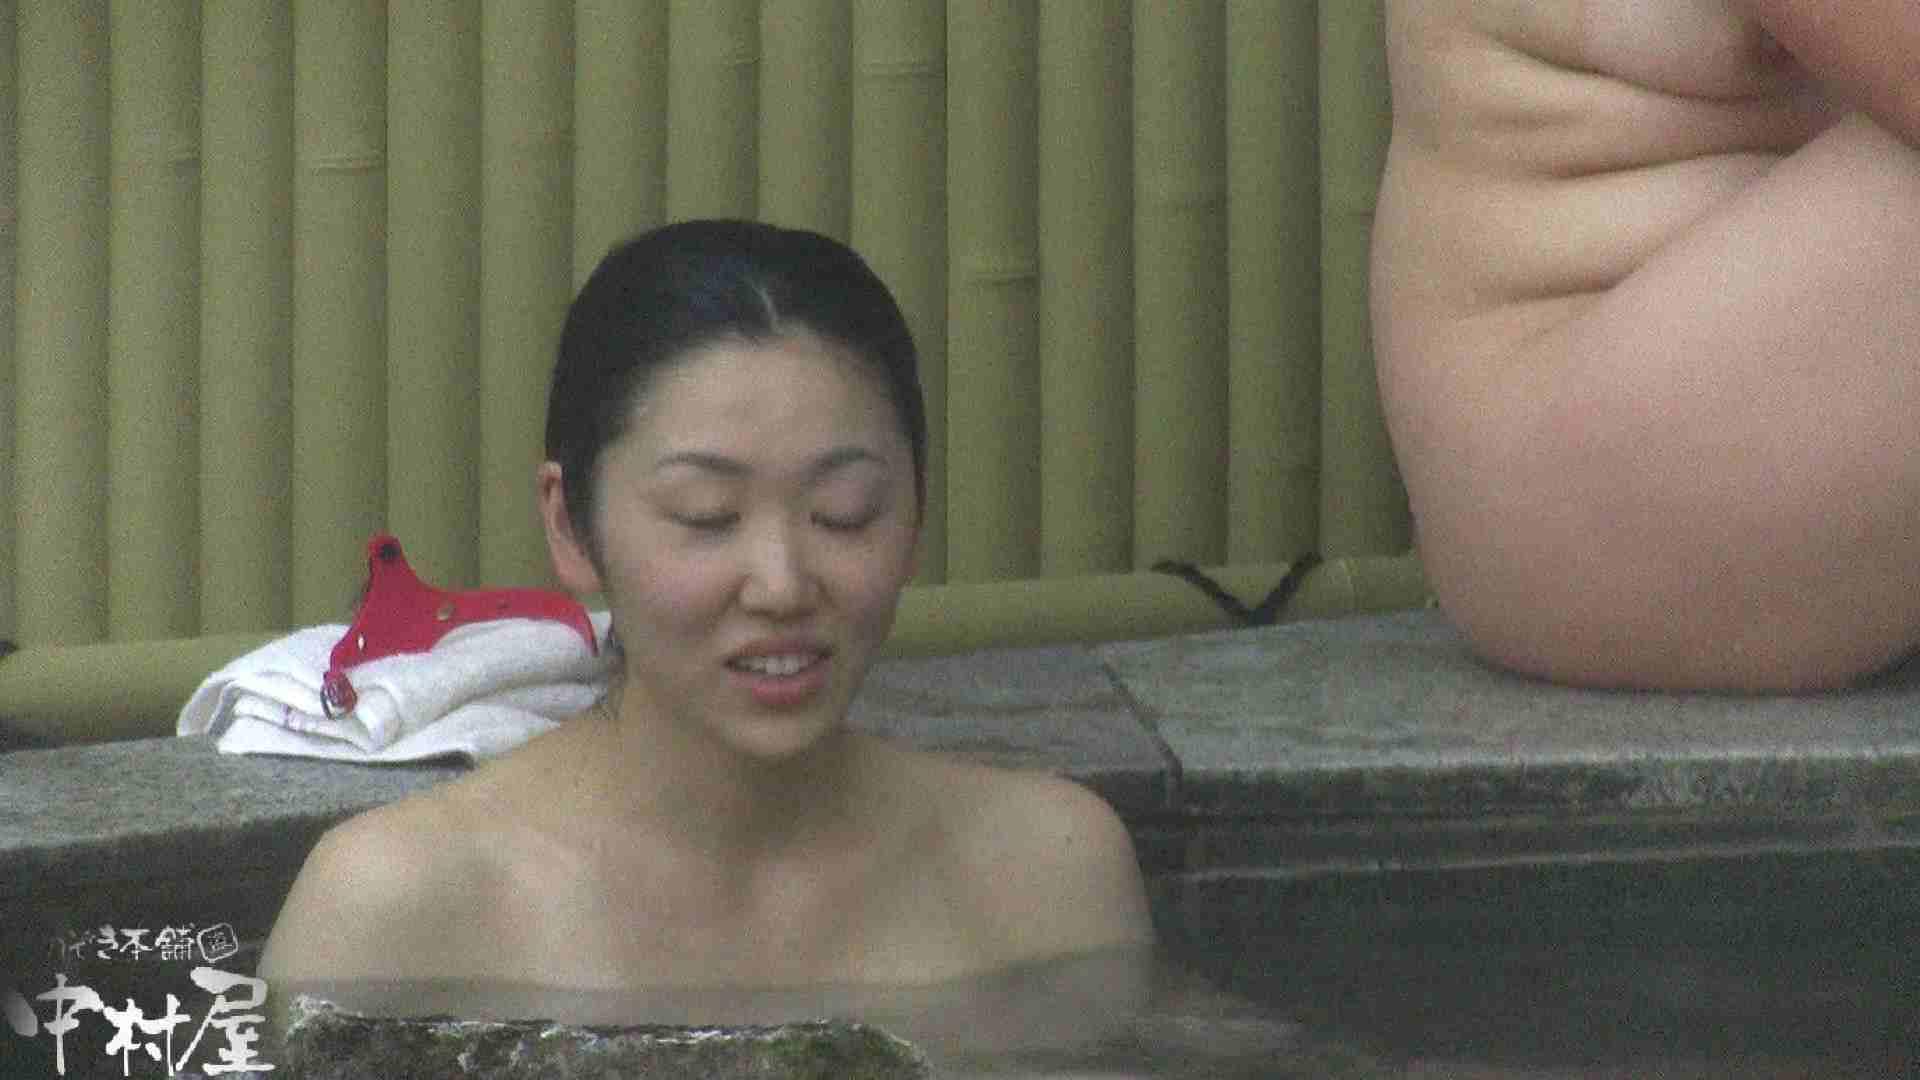 Aquaな露天風呂Vol.917 盗撮シリーズ   露天風呂編  108PIX 31